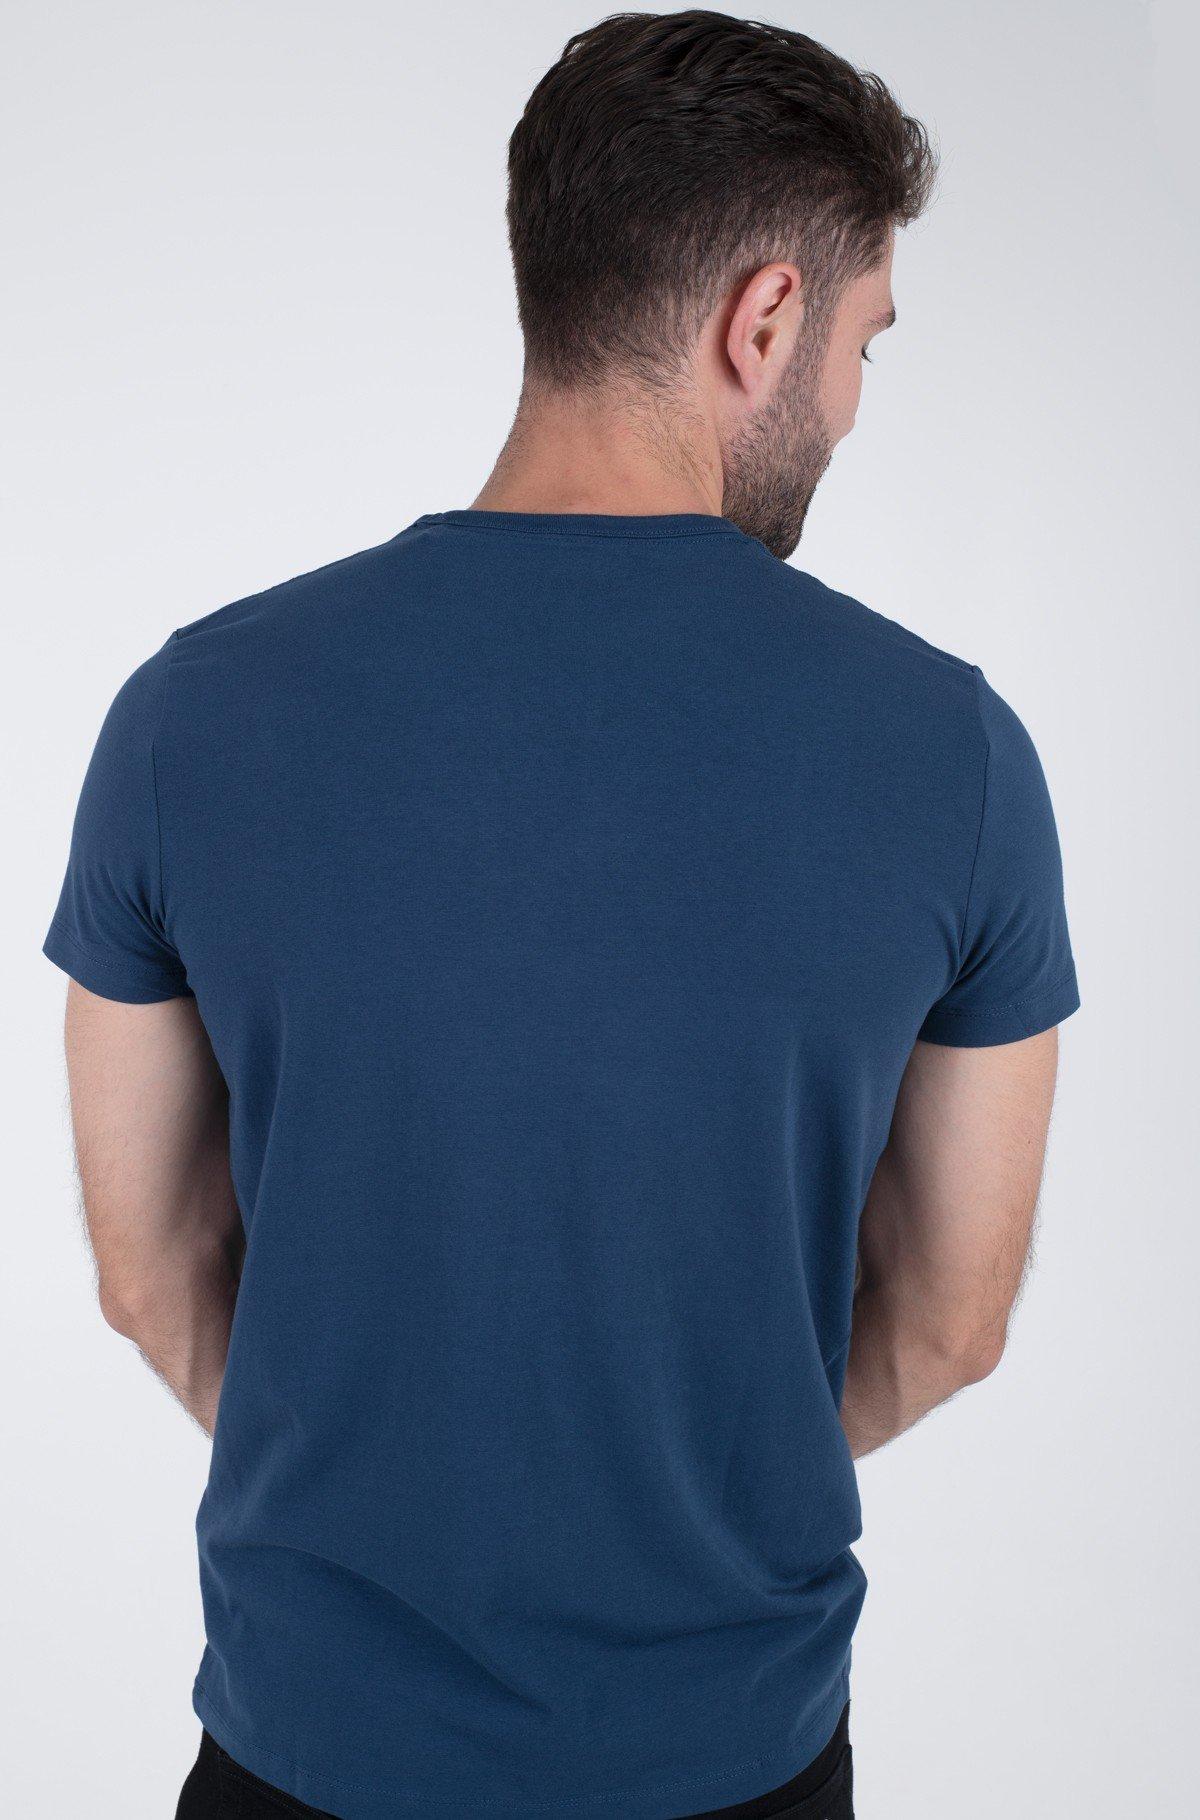 T-shirt ORIGINAL BASIC 3/PM506153-full-2